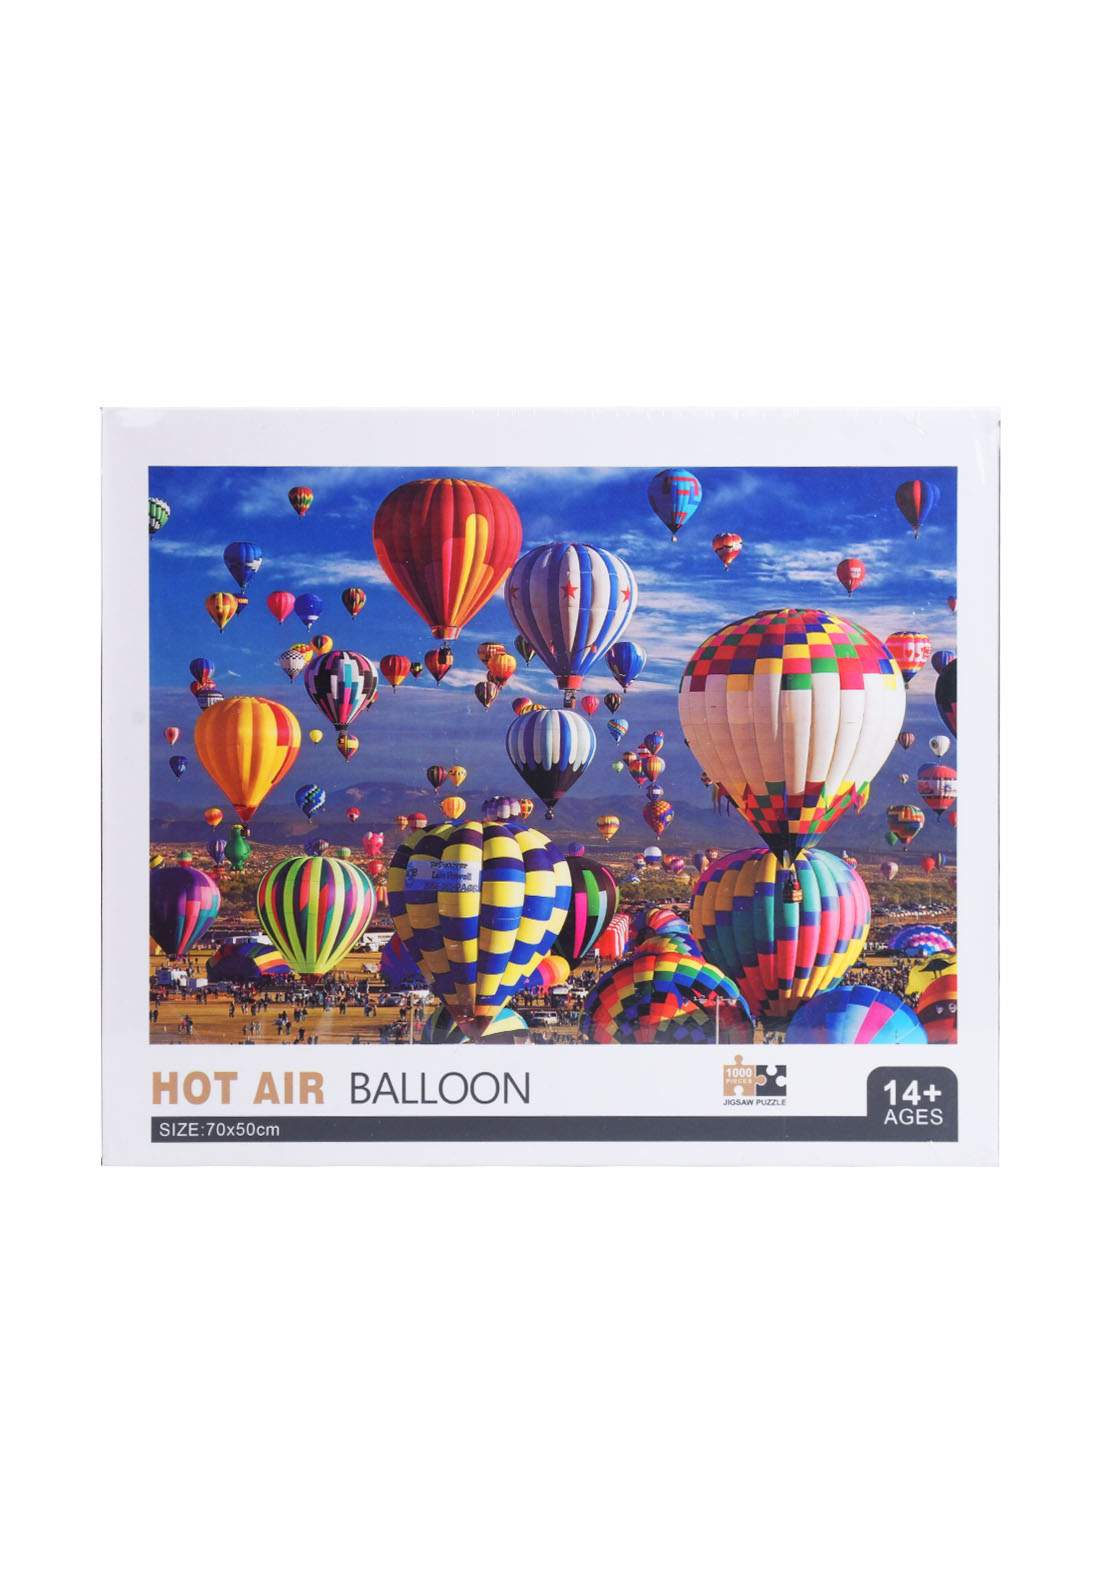 Jigsaw Puzzle Hot Air Balloon 1000Pcs لعبة تركيب القطع بشكل منطاد